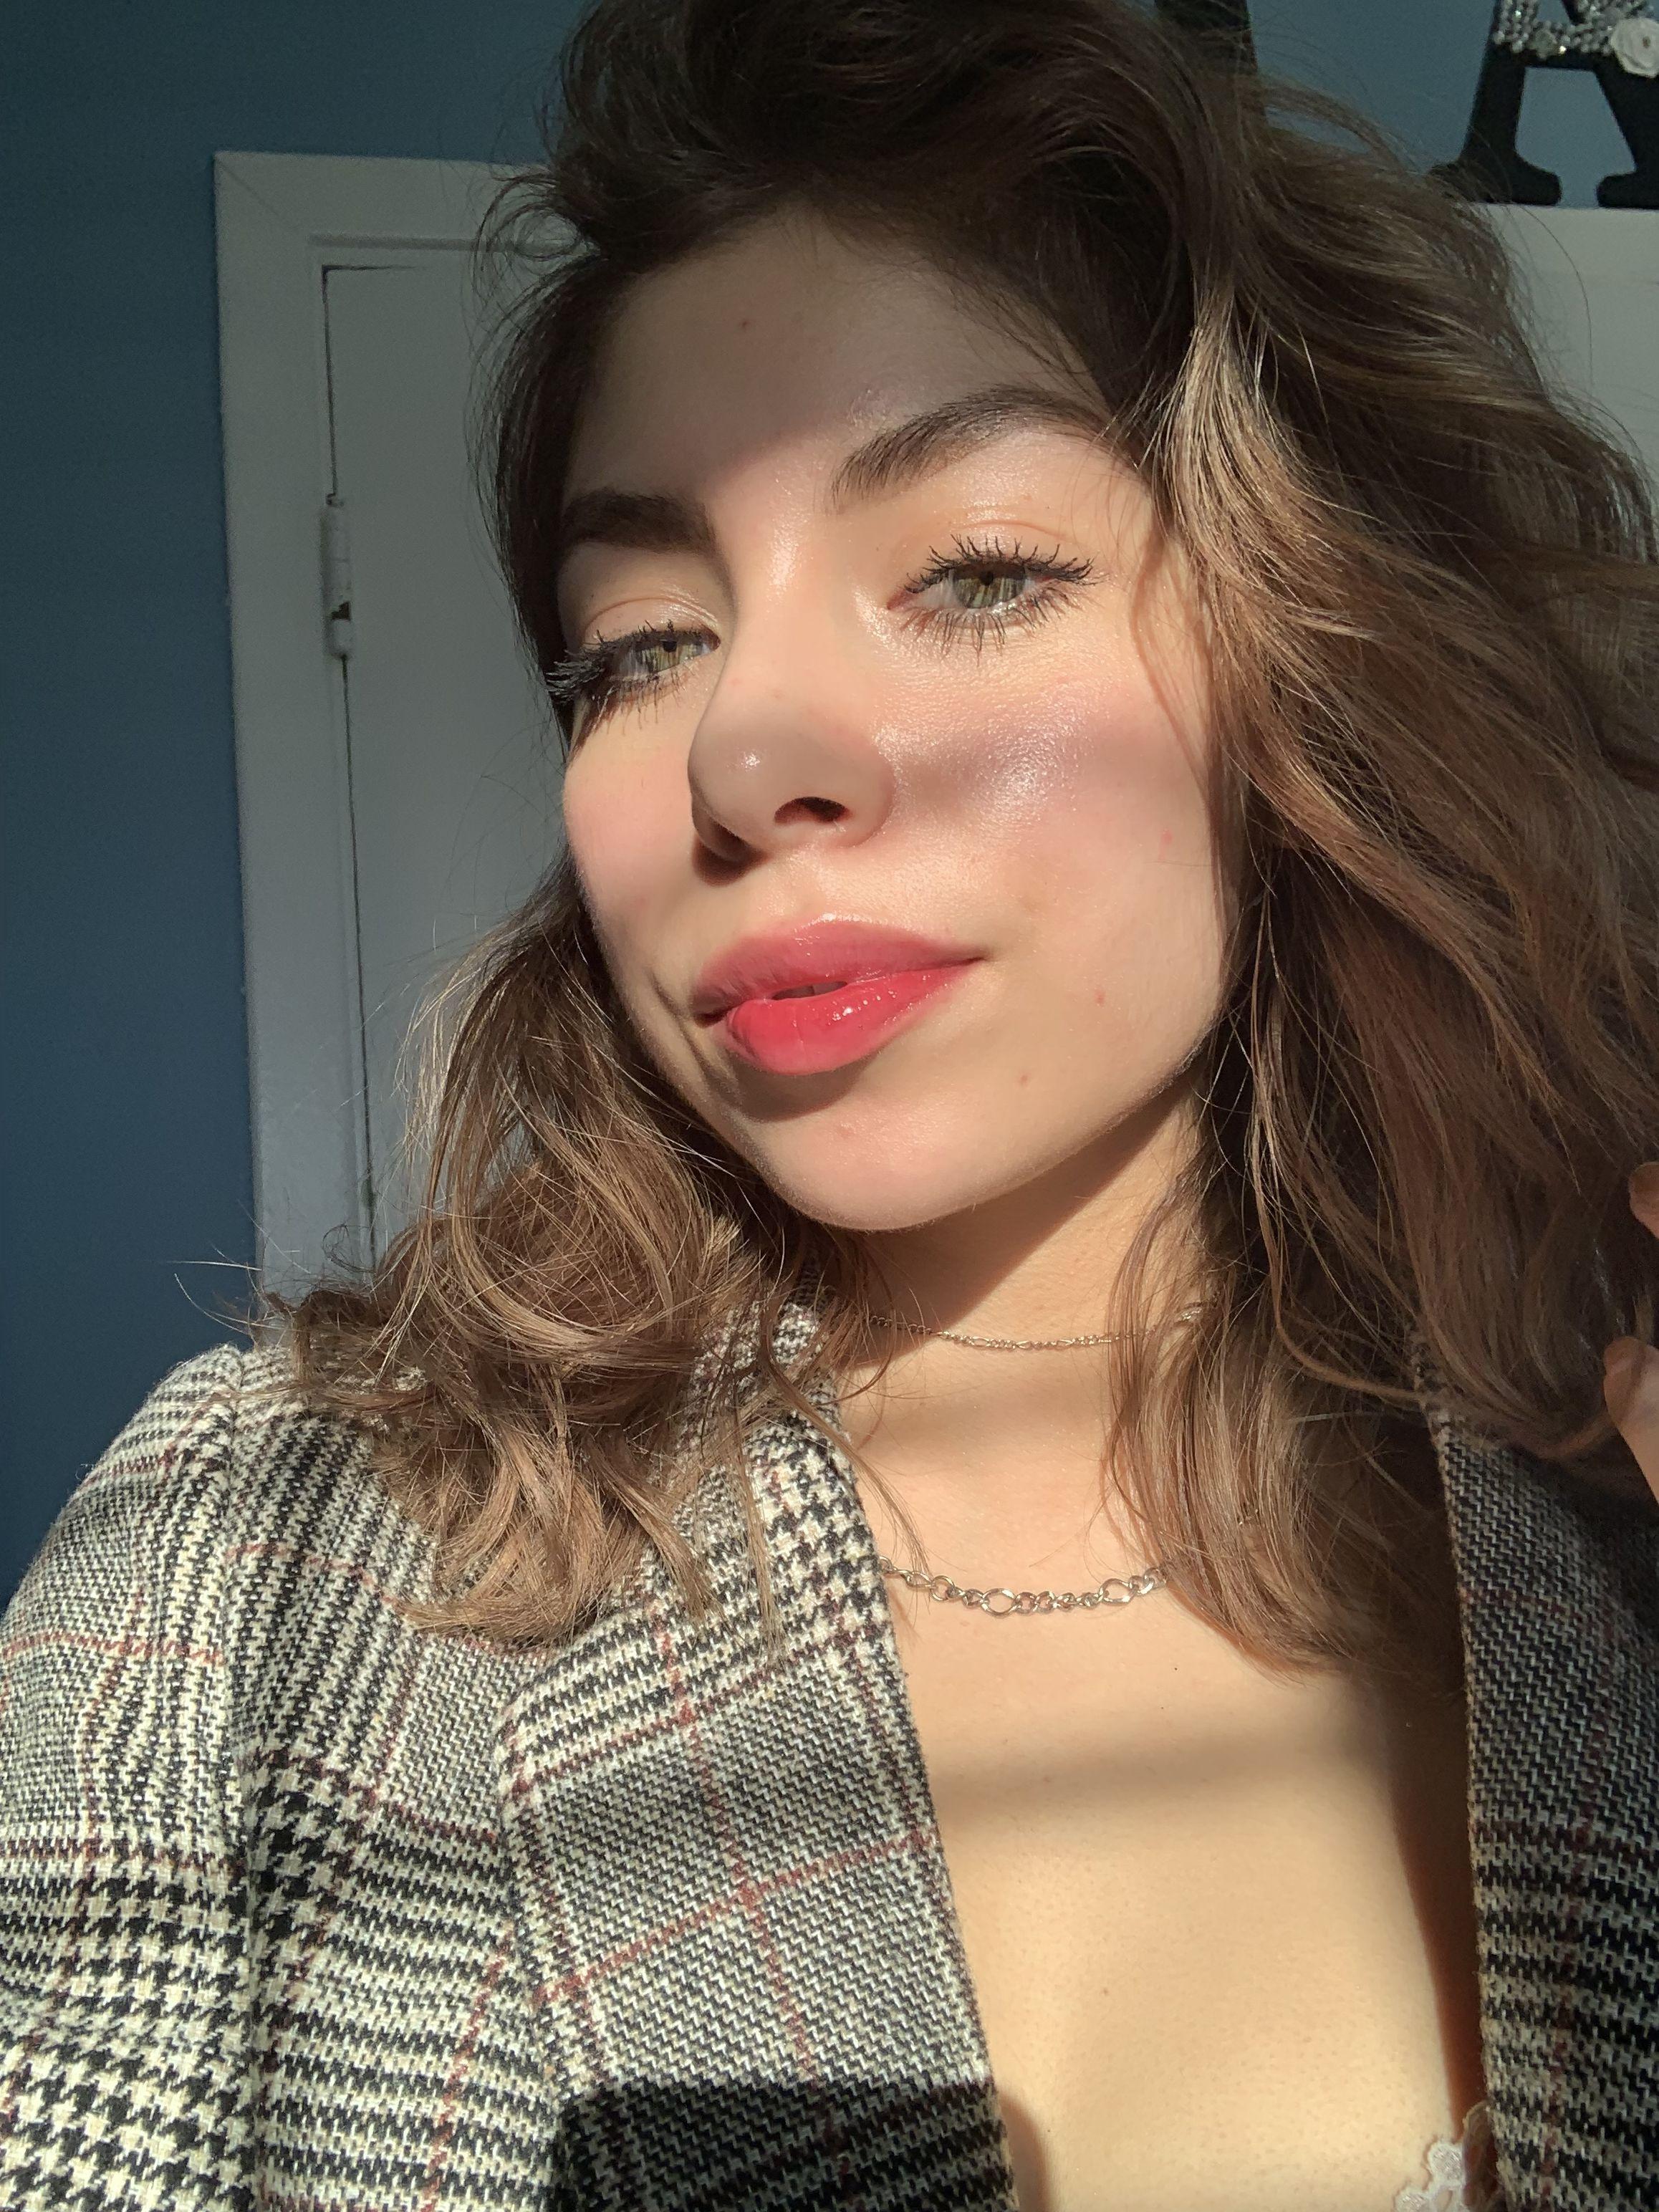 Ig Theroguemakeup Dewy Skin Red Lip Natural Brows Light